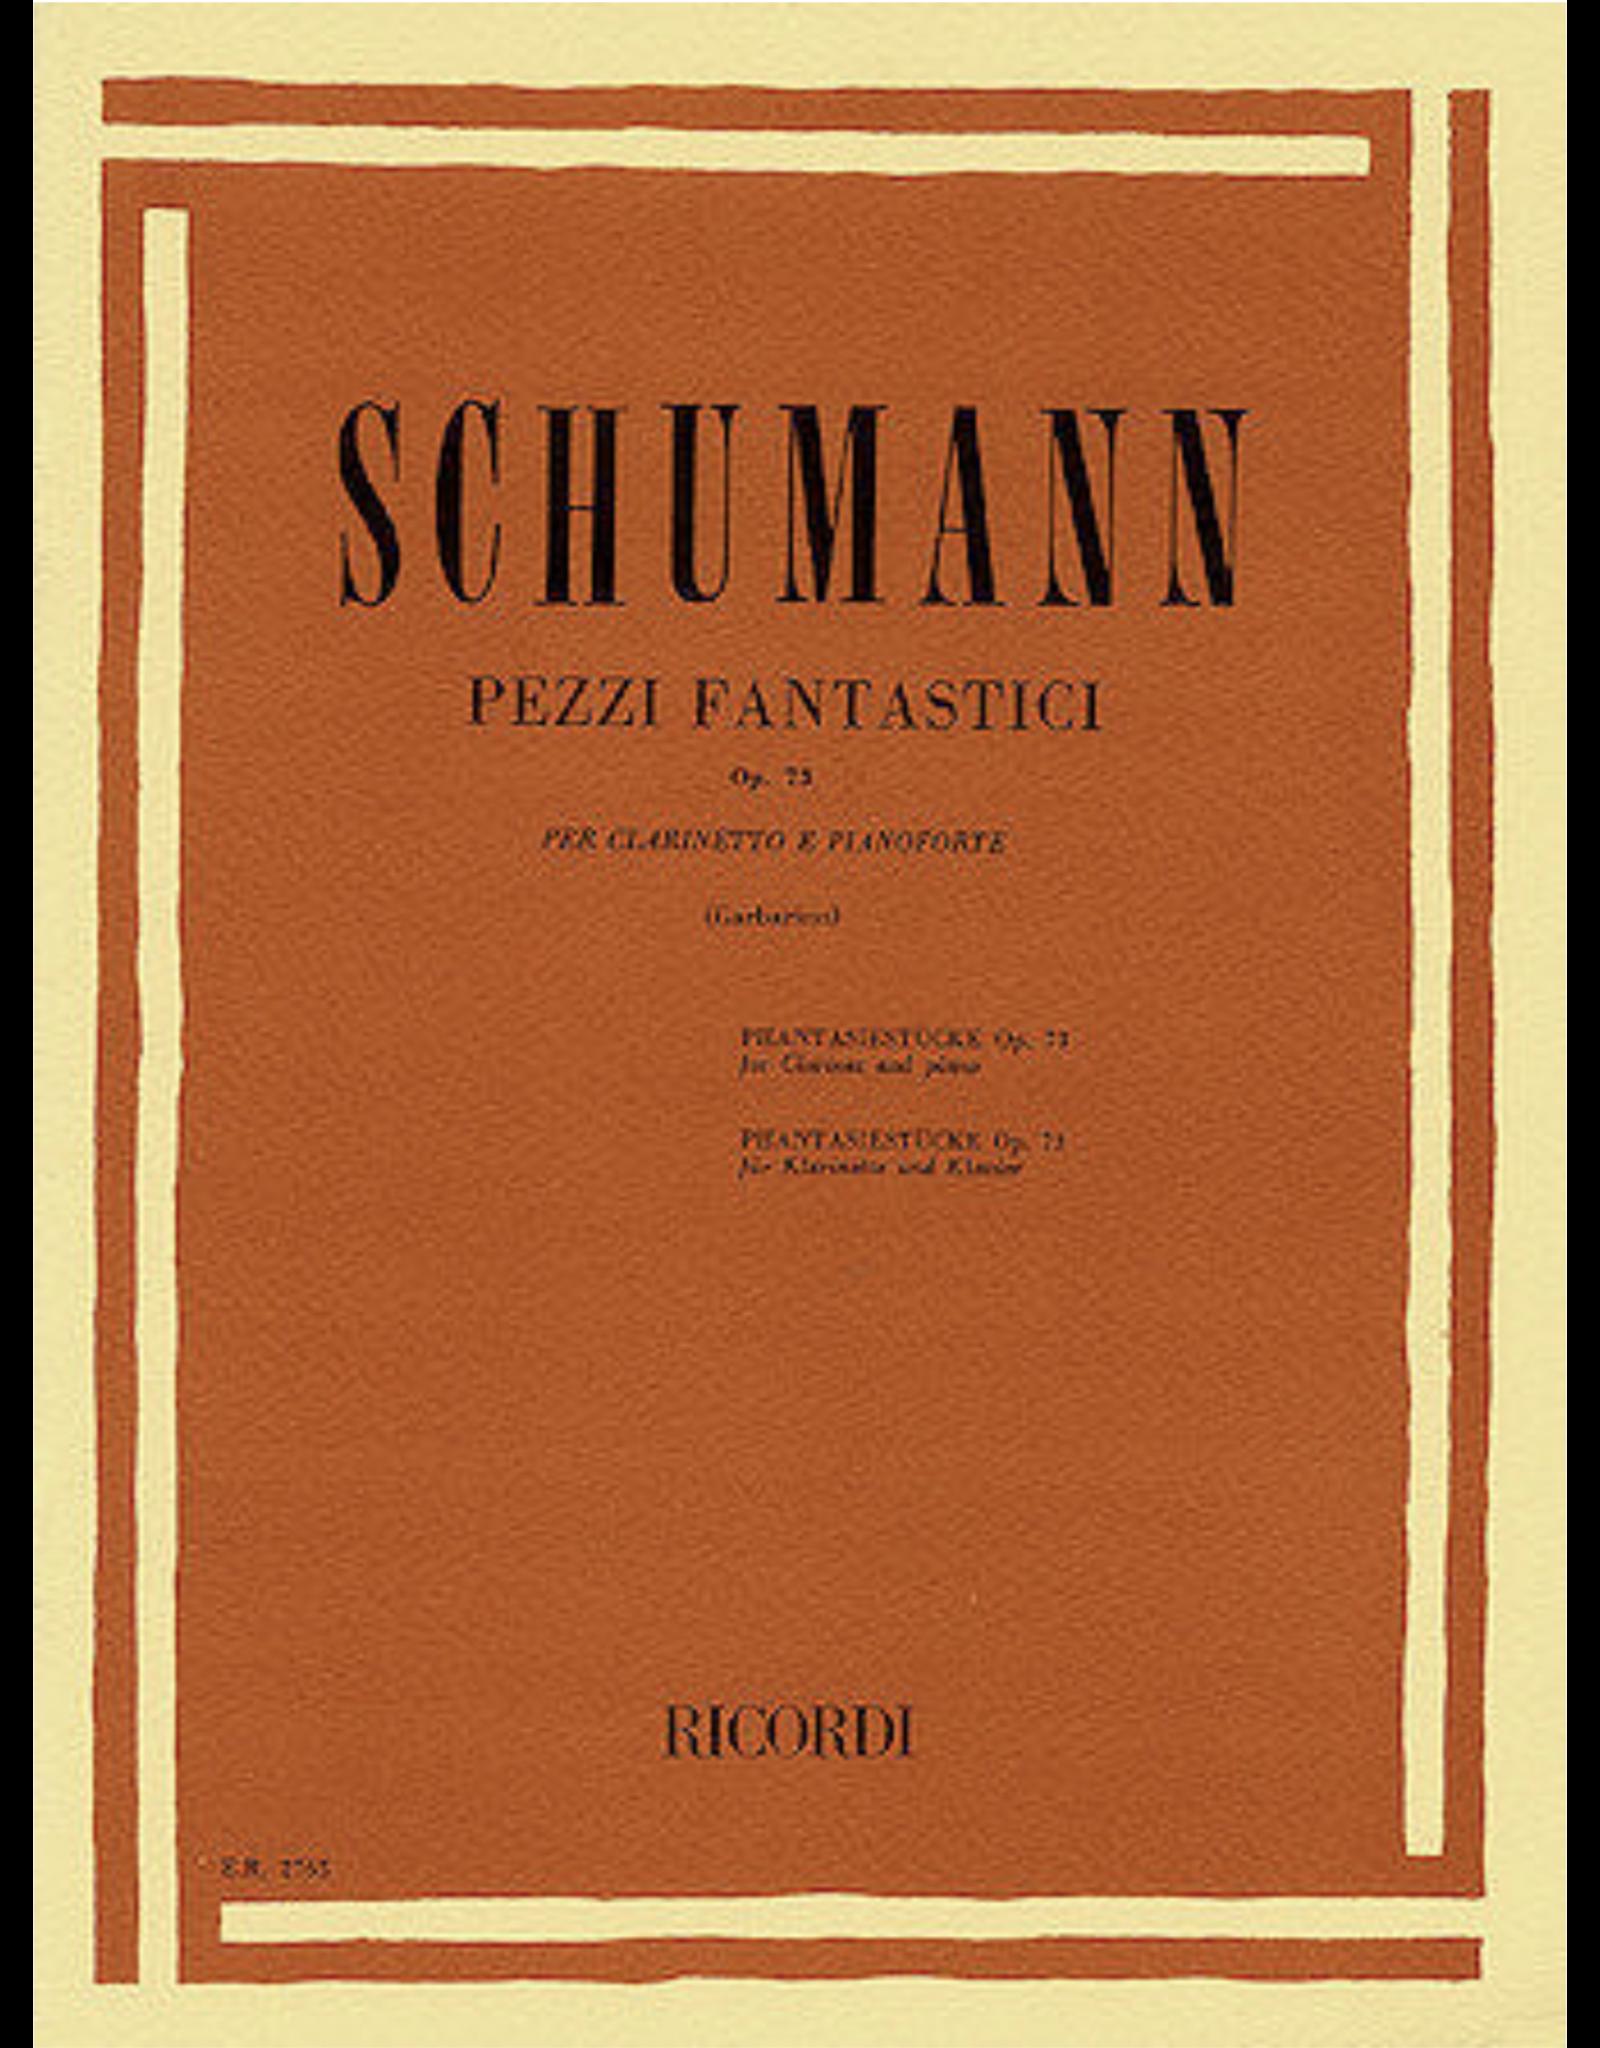 Ricordi Schumann Pezzi Fantastici/ Phantasiestucke Op. 73 For Clarinet and Piano